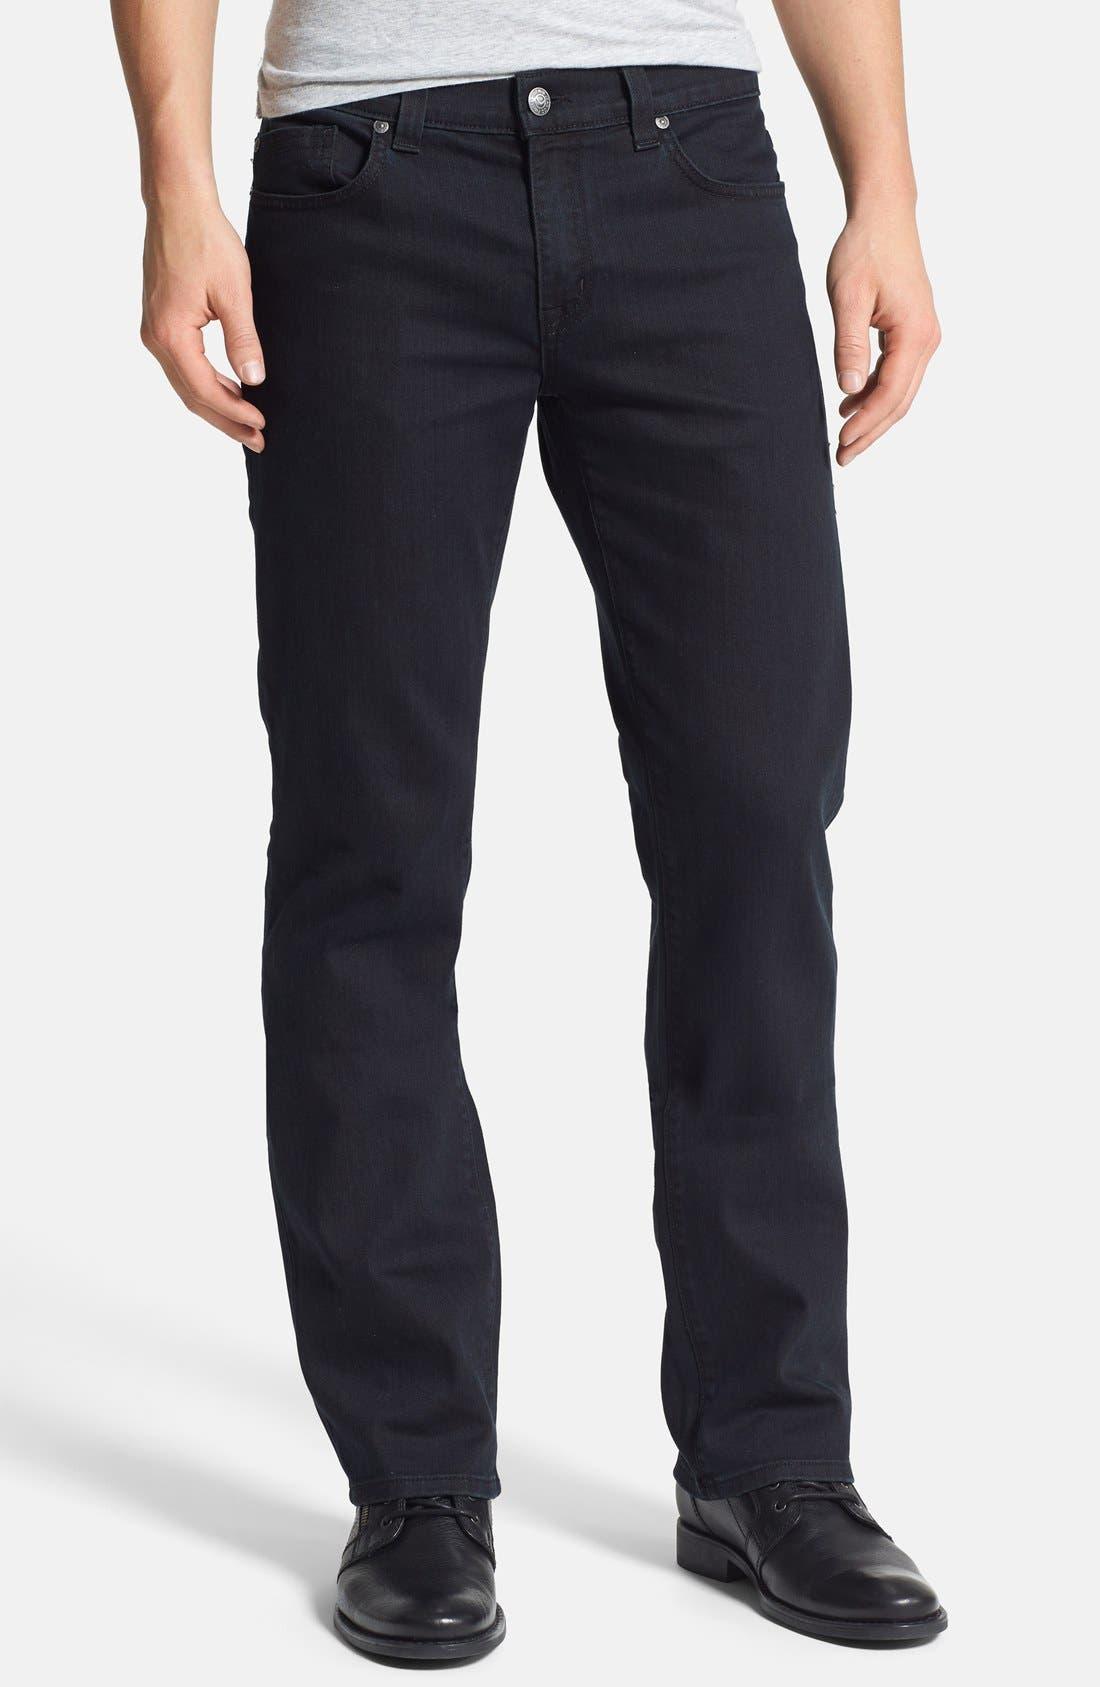 Main Image - Fidelity Denim '50-11' Straight Leg Jeans (Town Black Vintage)